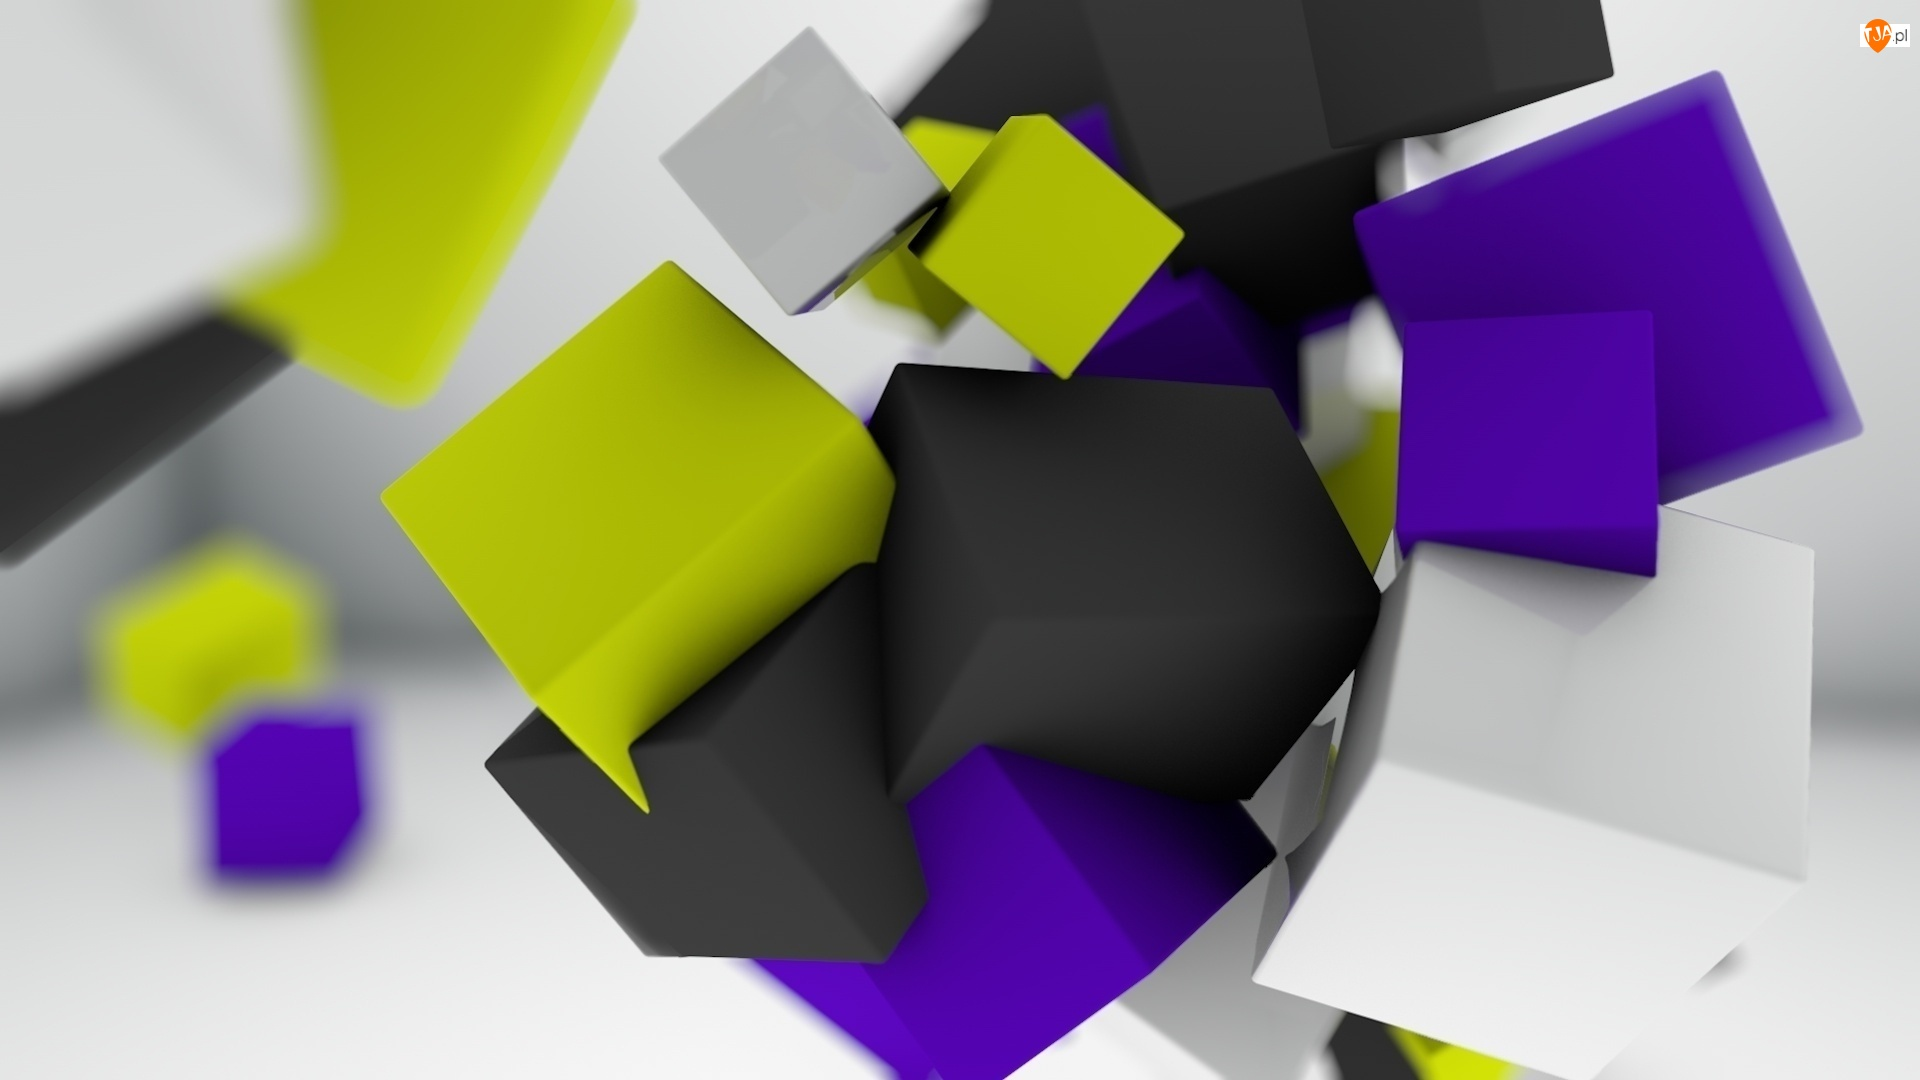 Kostki, Kolorowe, 3D